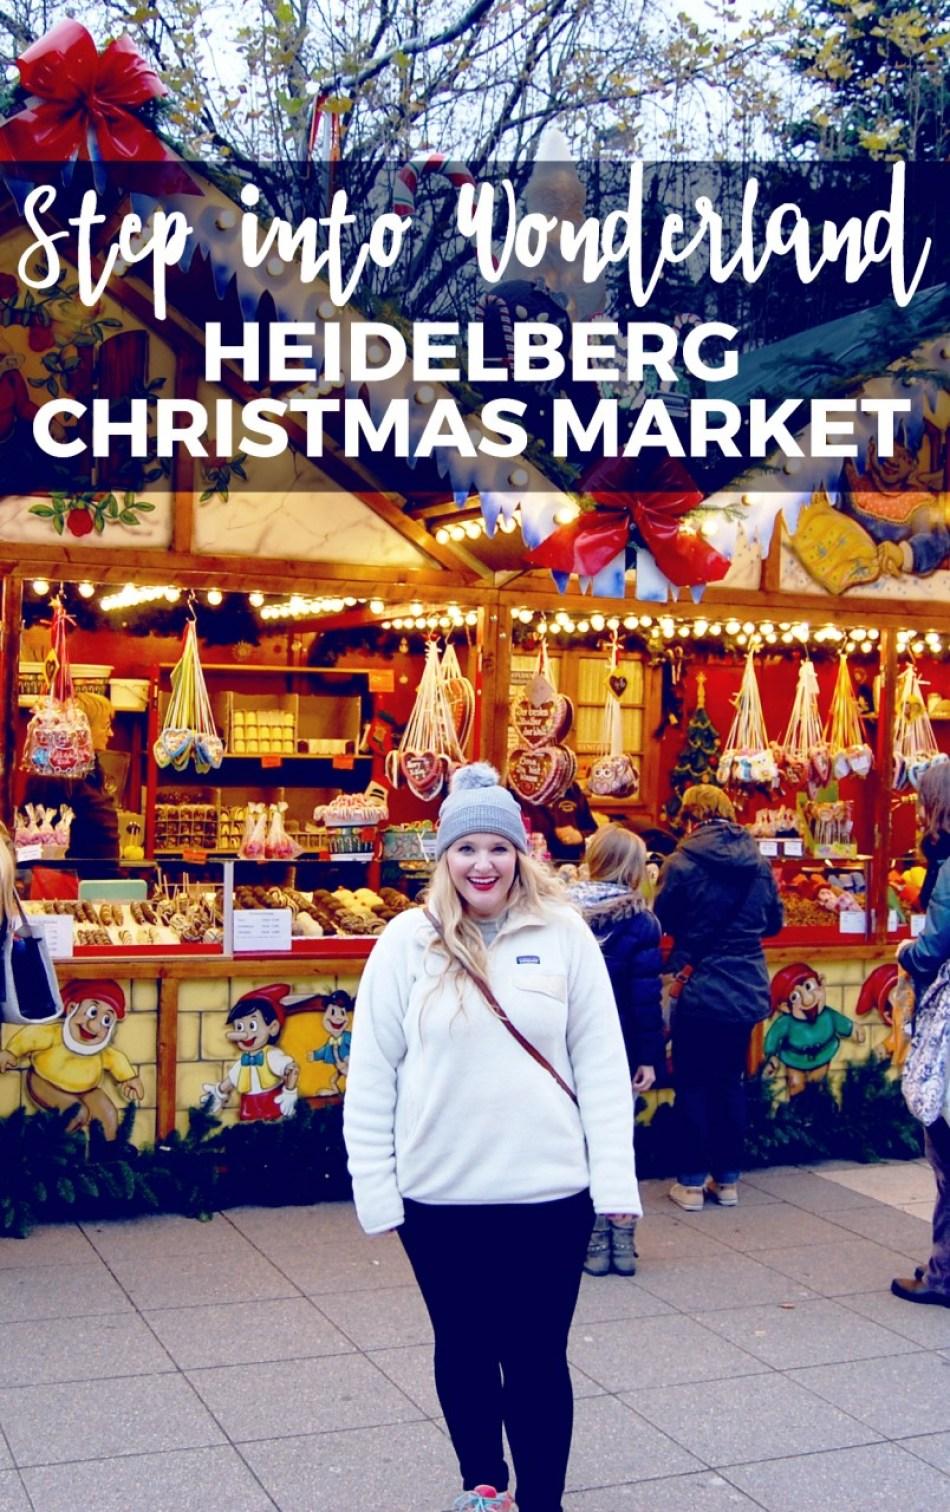 step-into-wonderland-with-heidelberg-christmas-market